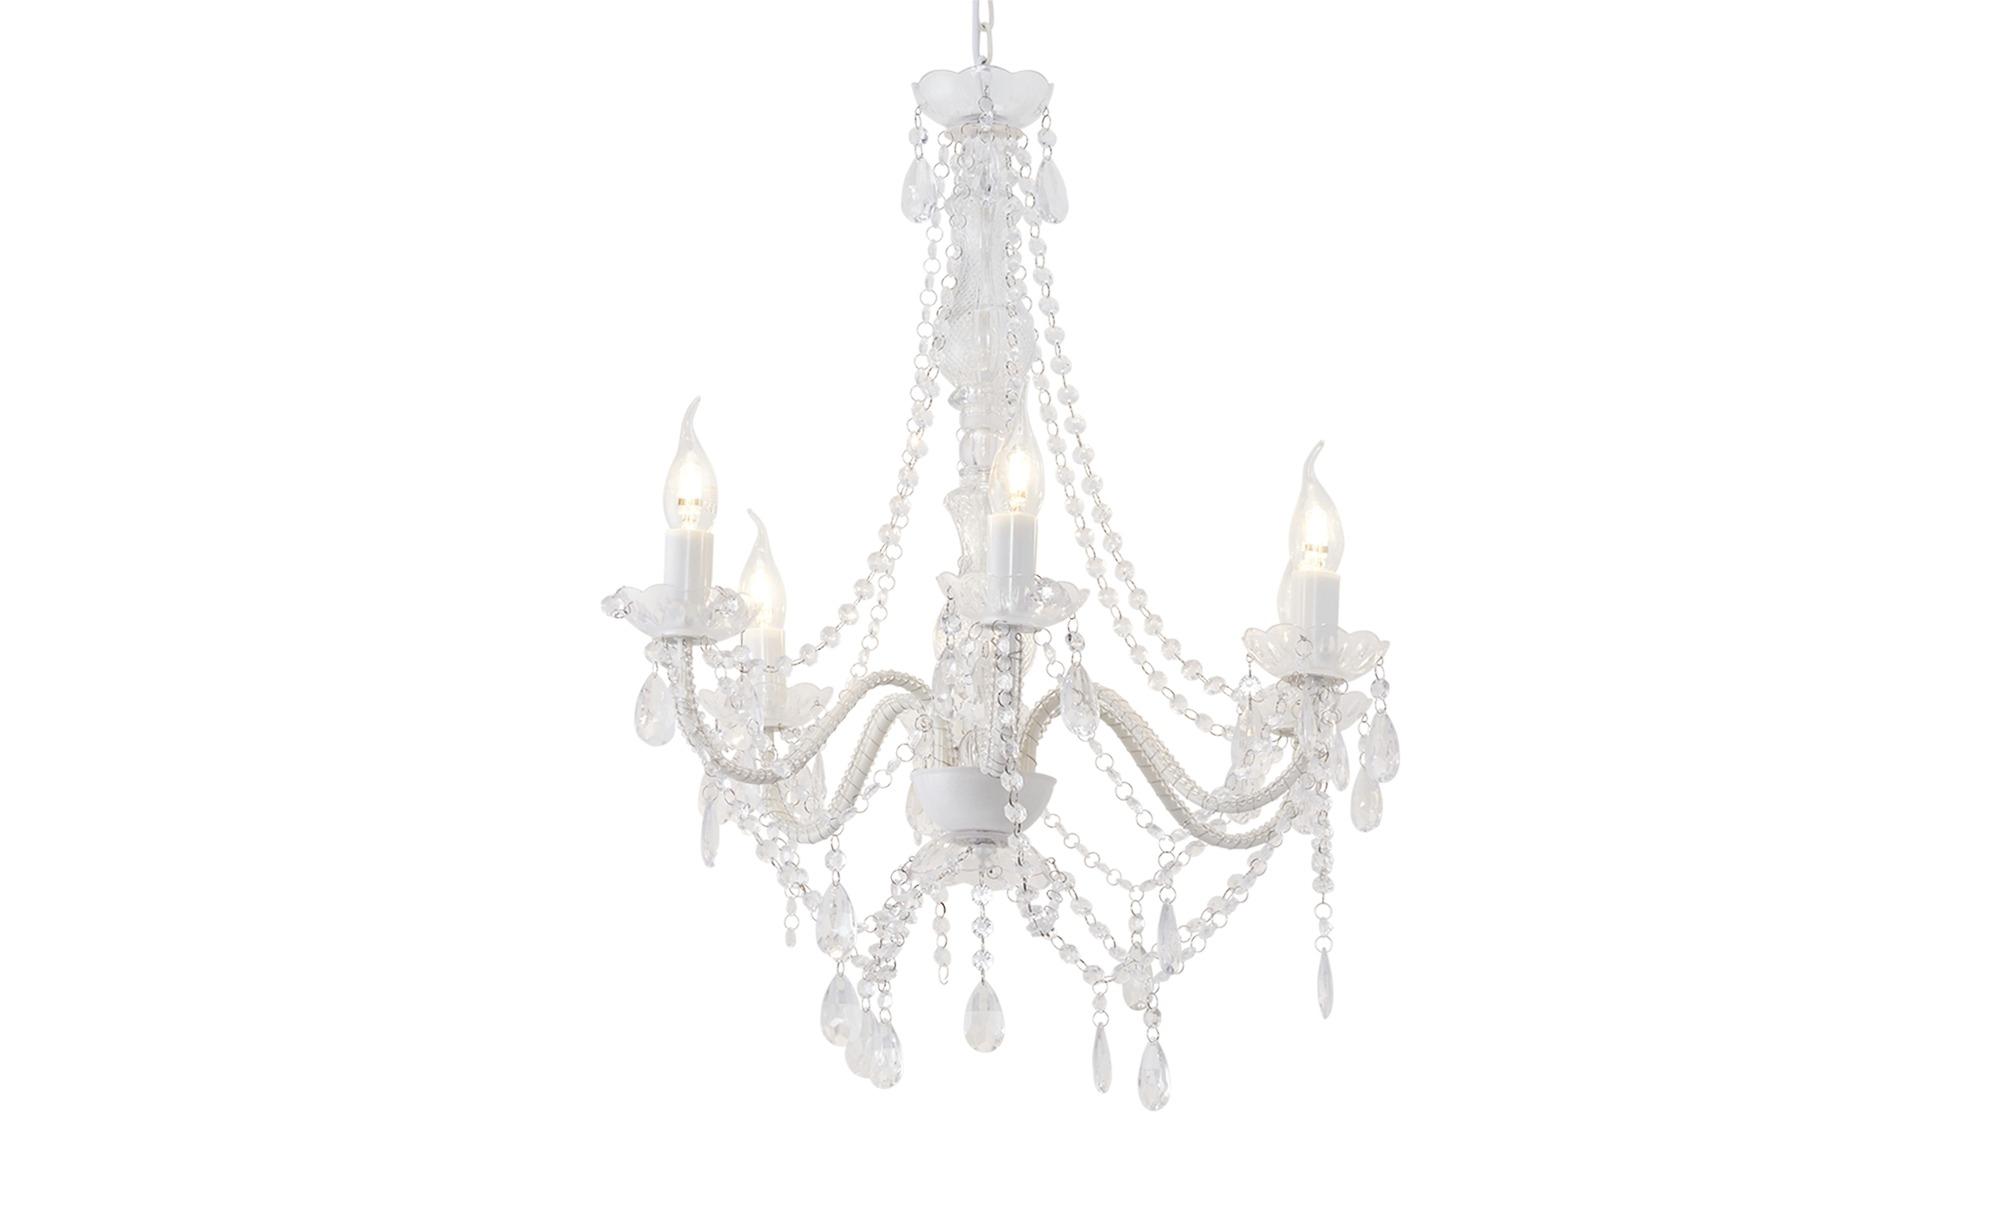 Kare Kronleuchter, 6-flammig, transparent ¦ transparent/klar ¦ Maße (cm): H: 70 Ø: 55 Lampen & Leuchten > Innenleuchten > Kronleuchter - Höffner